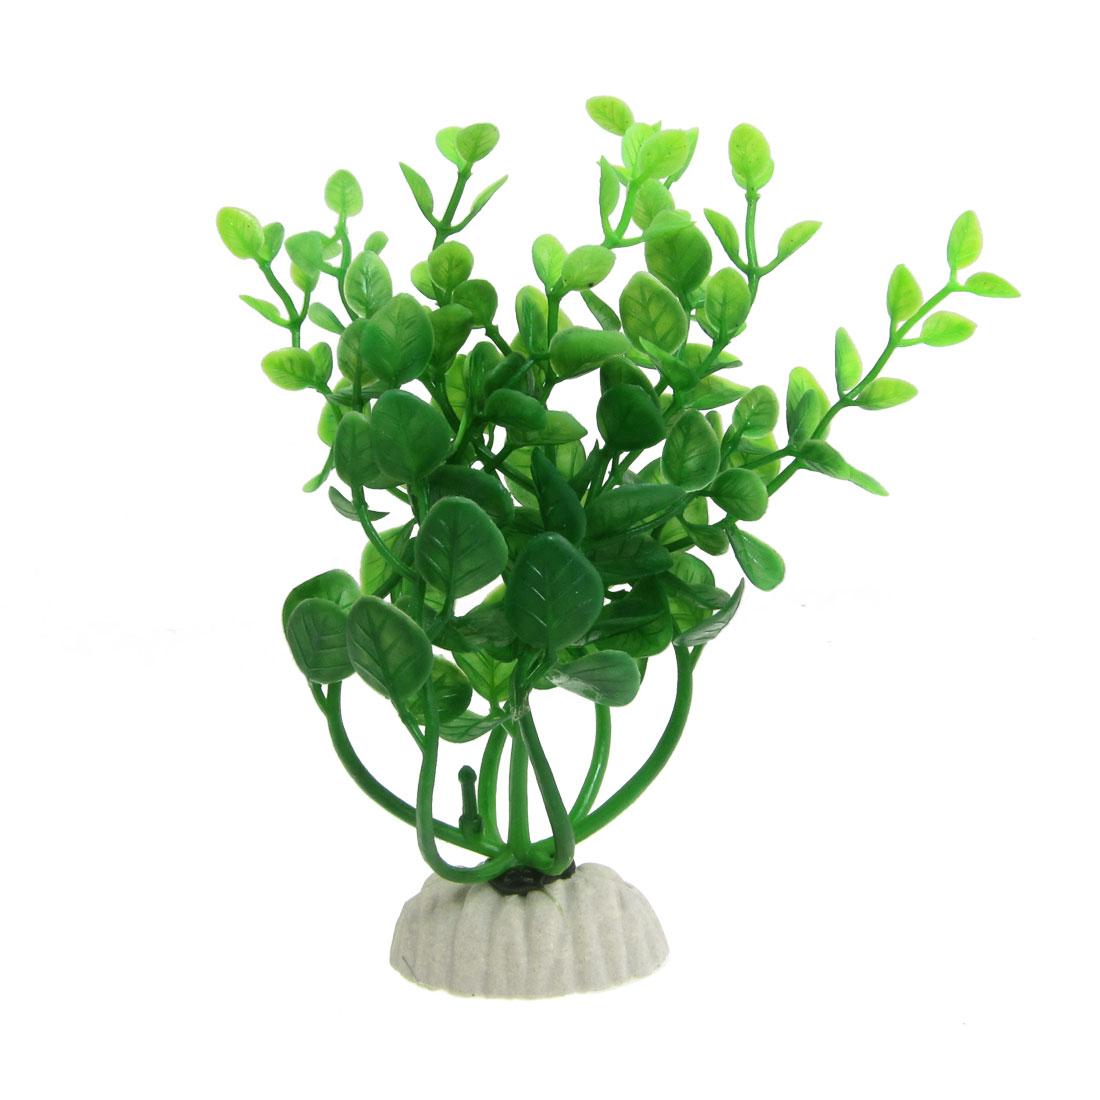 Oval Shape Base Aquarium Landscaping Green Leaf Plastic Water Plants